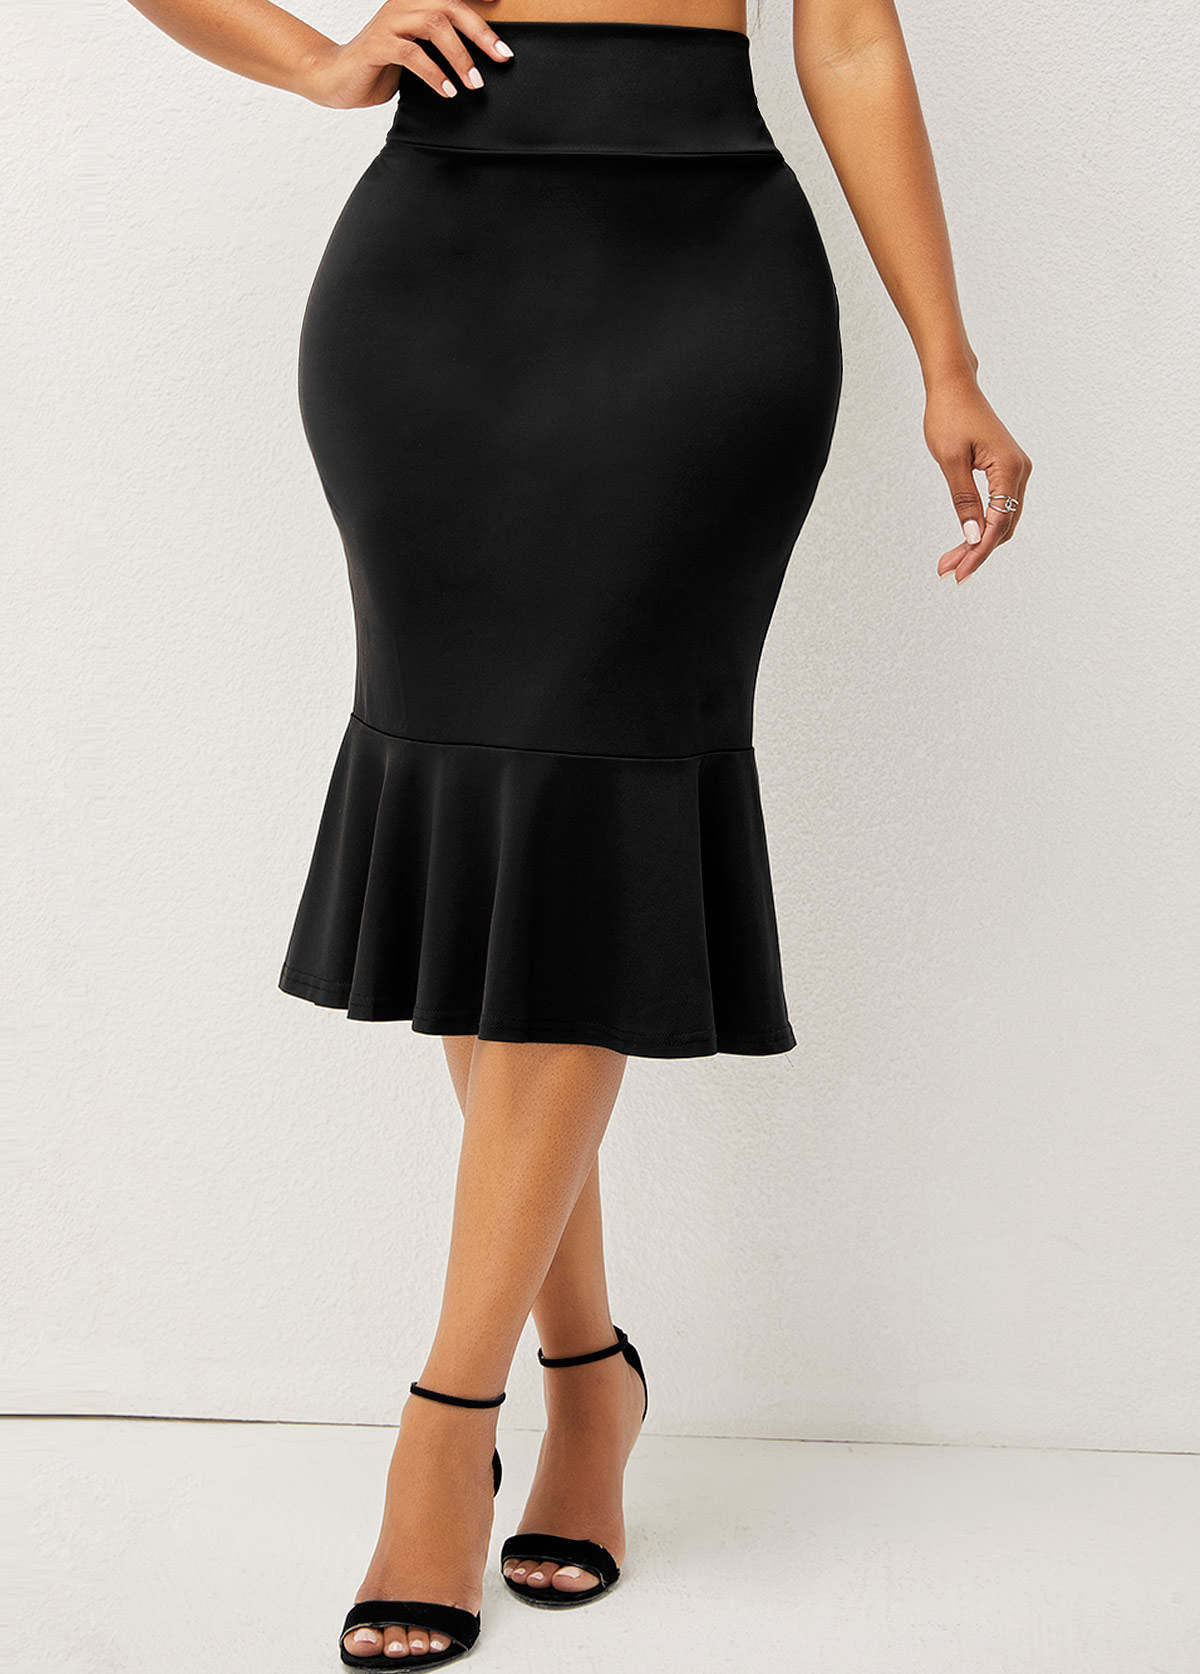 ROTITA Solid High Waisted Elastic Detail Mermaid Skirt